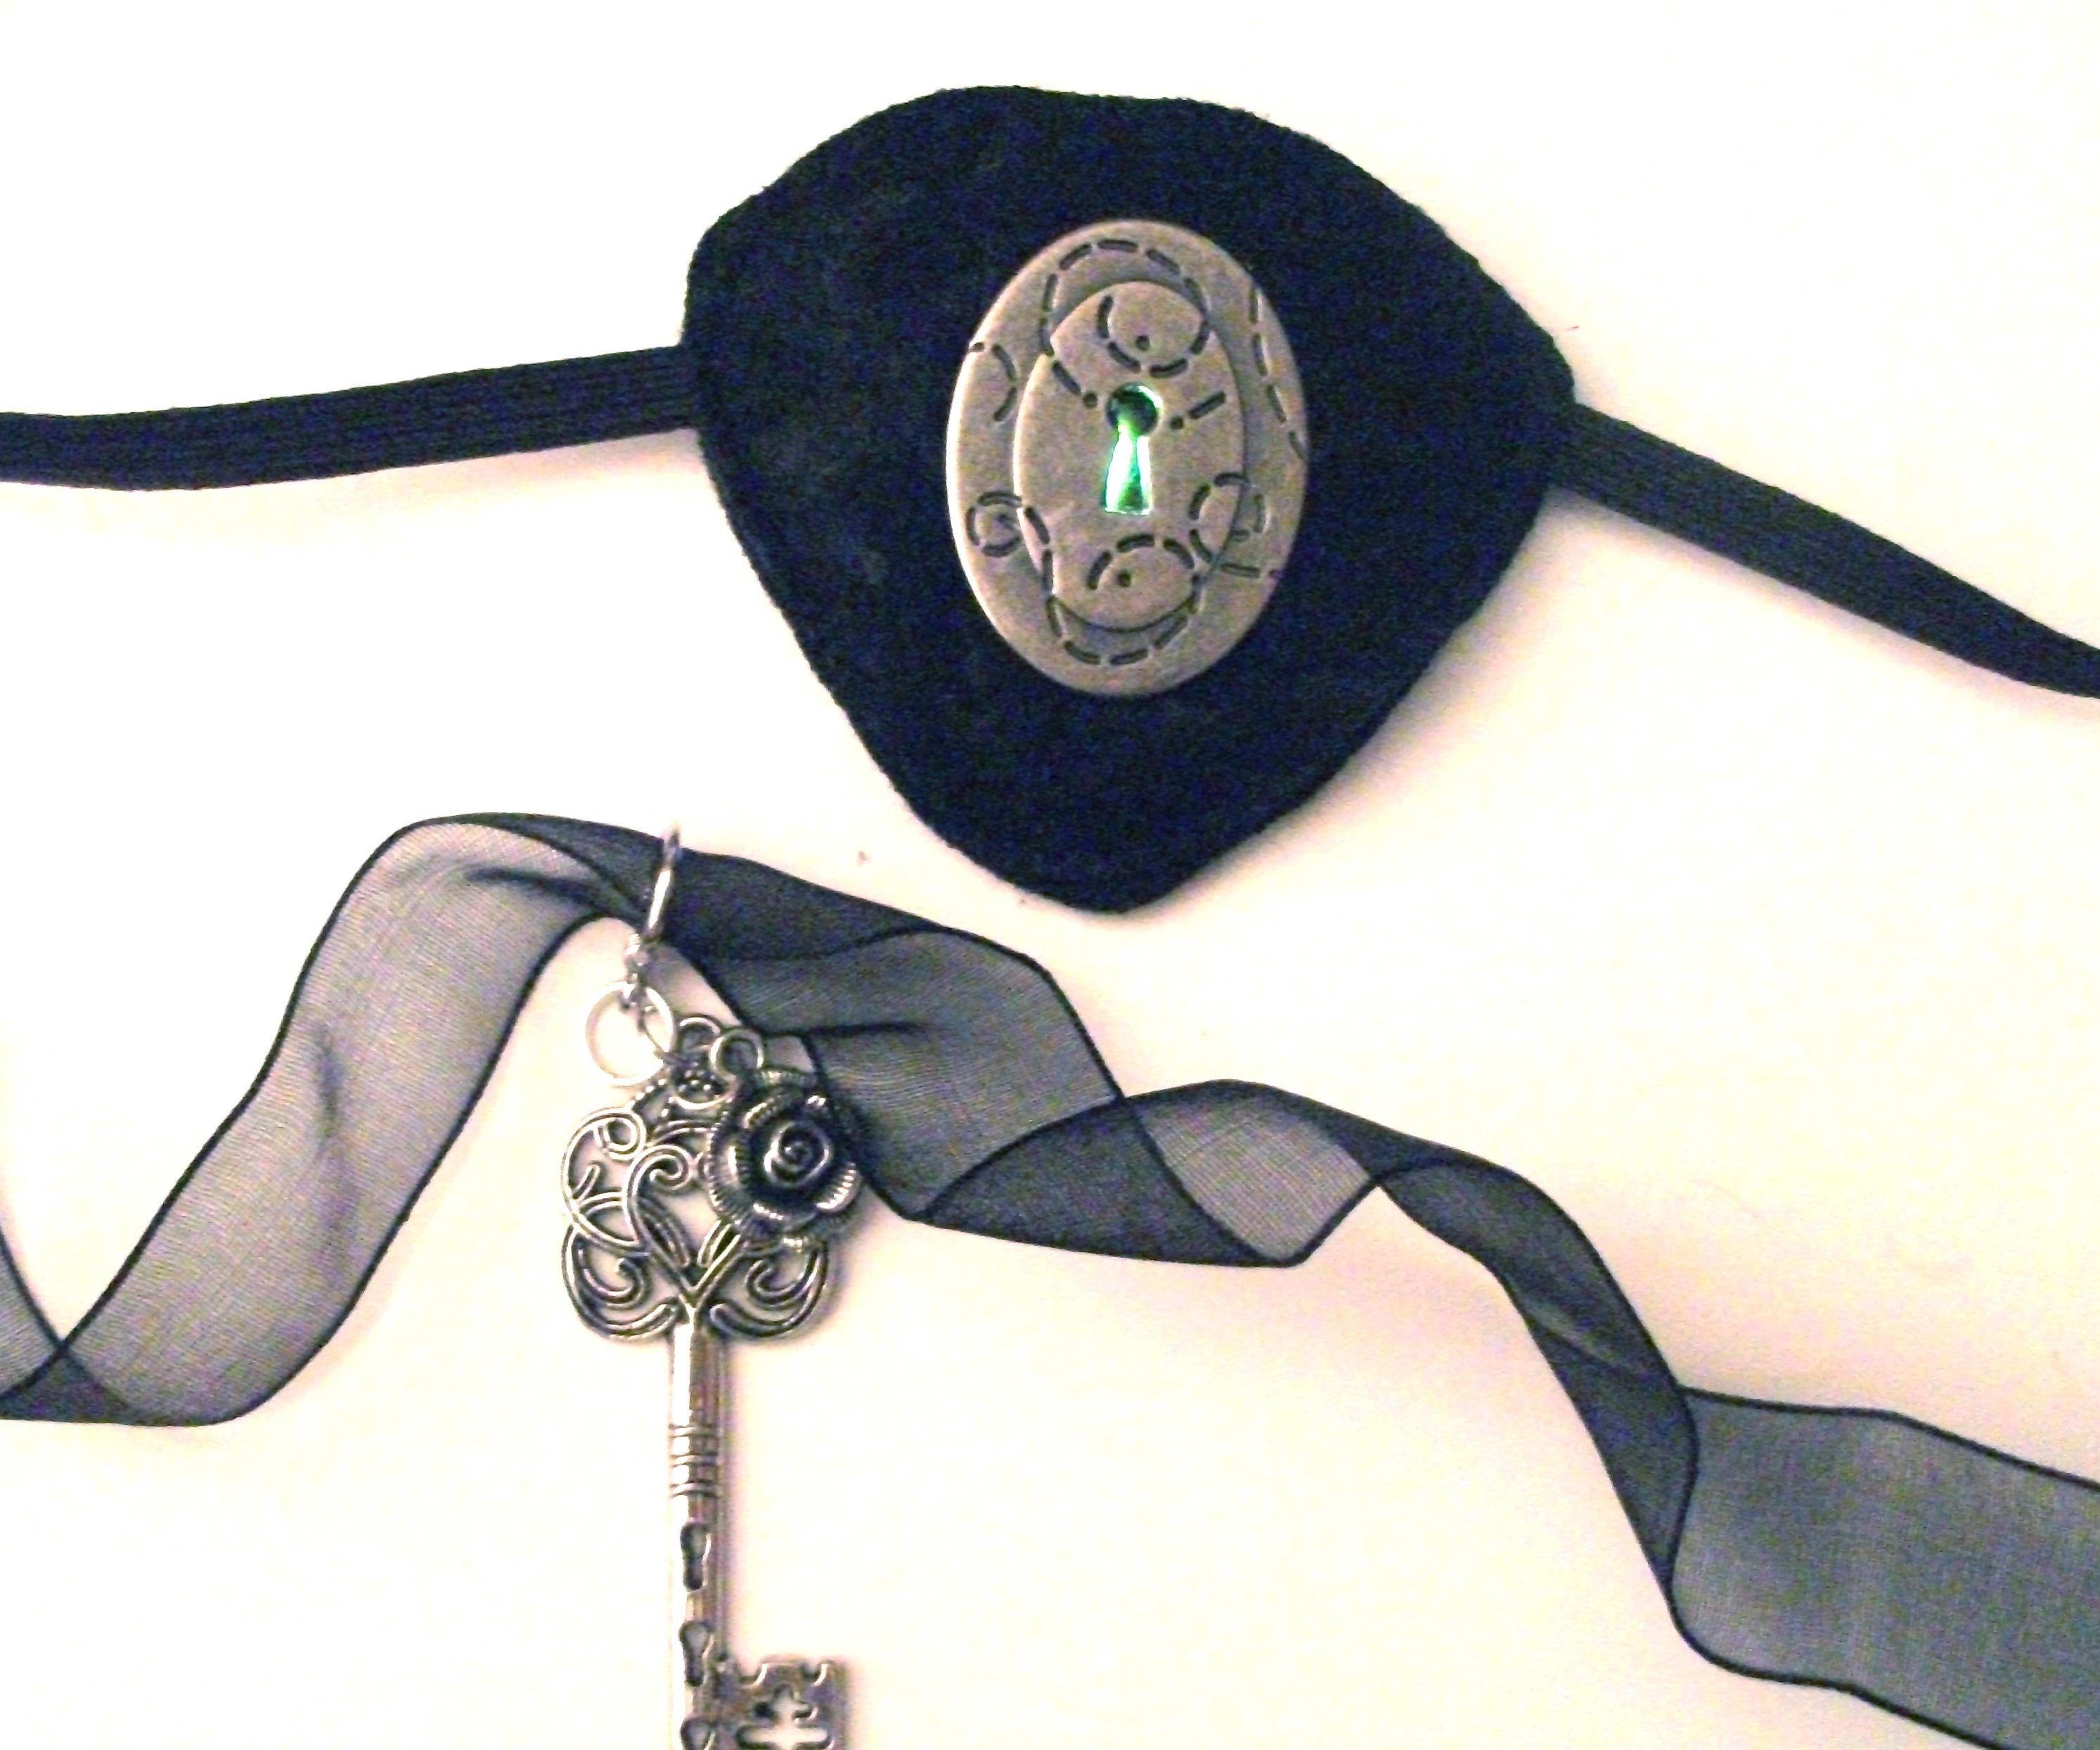 Pulsing Keyhole Eye Patch